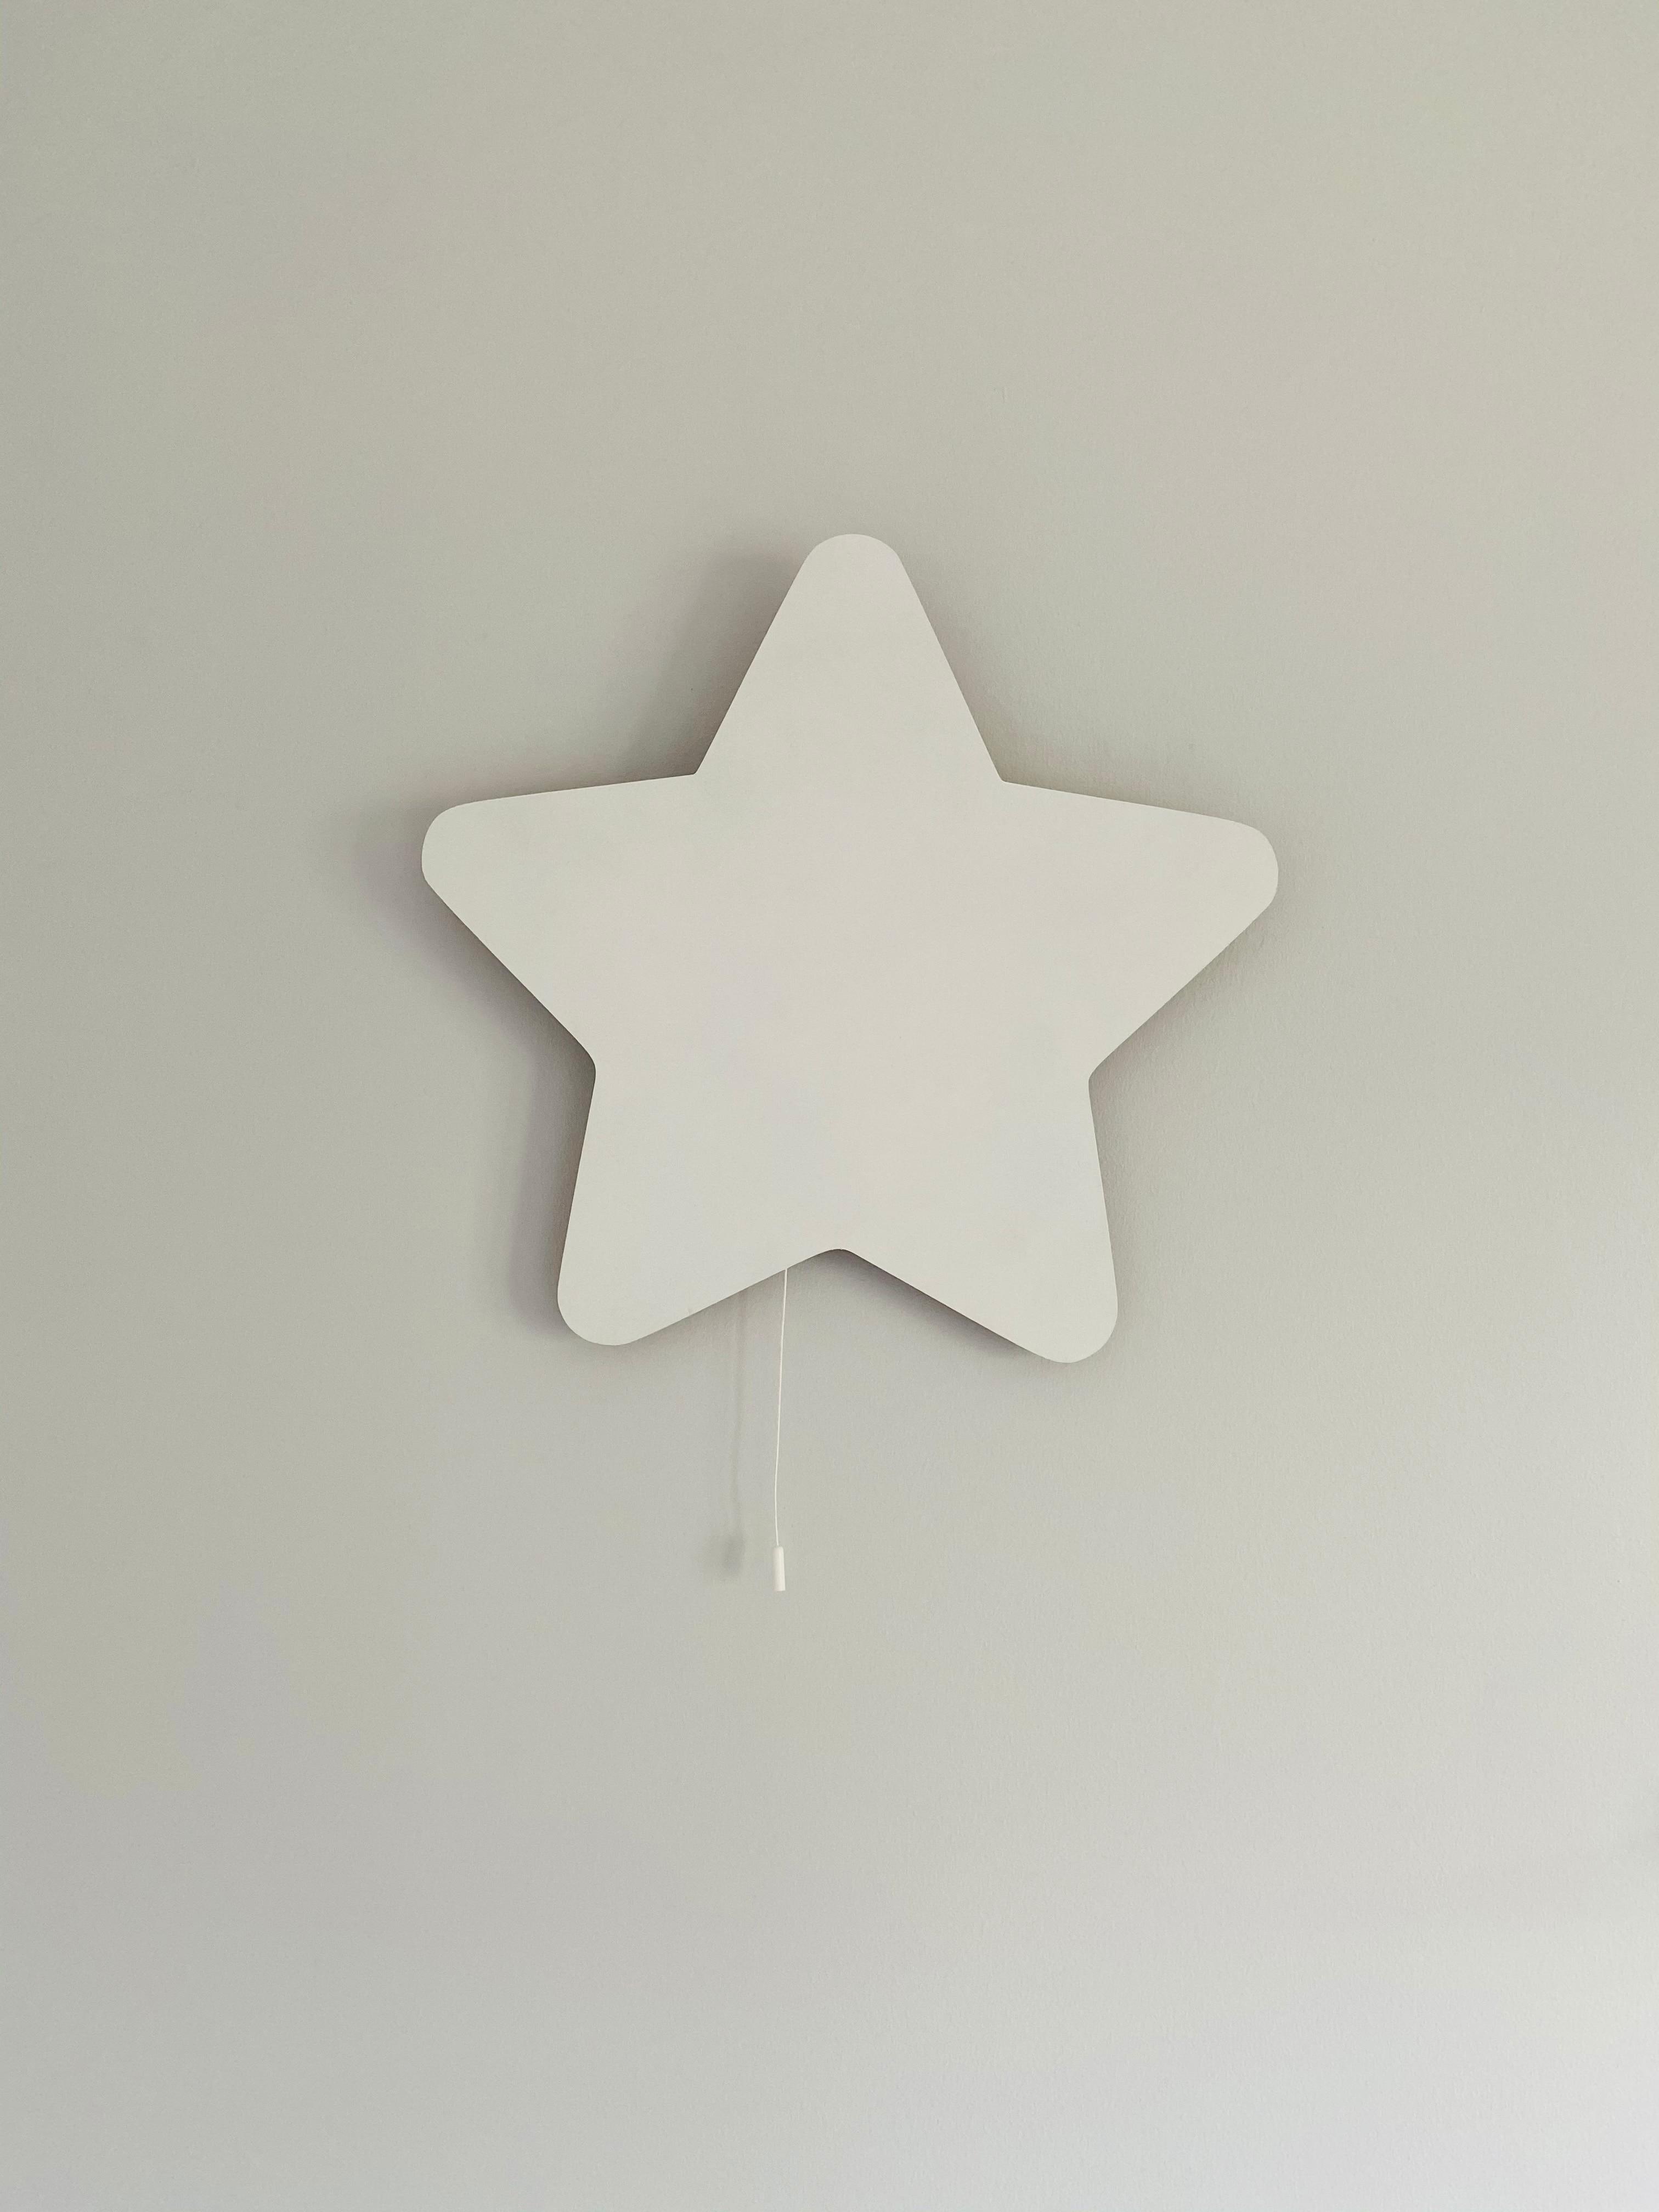 Set of 3- Star Balloon Moon Lamp Set, Baby Bedside Night Light, Nursery Wall Decor, Montessori Furniture, Colored Wall Light enlarge